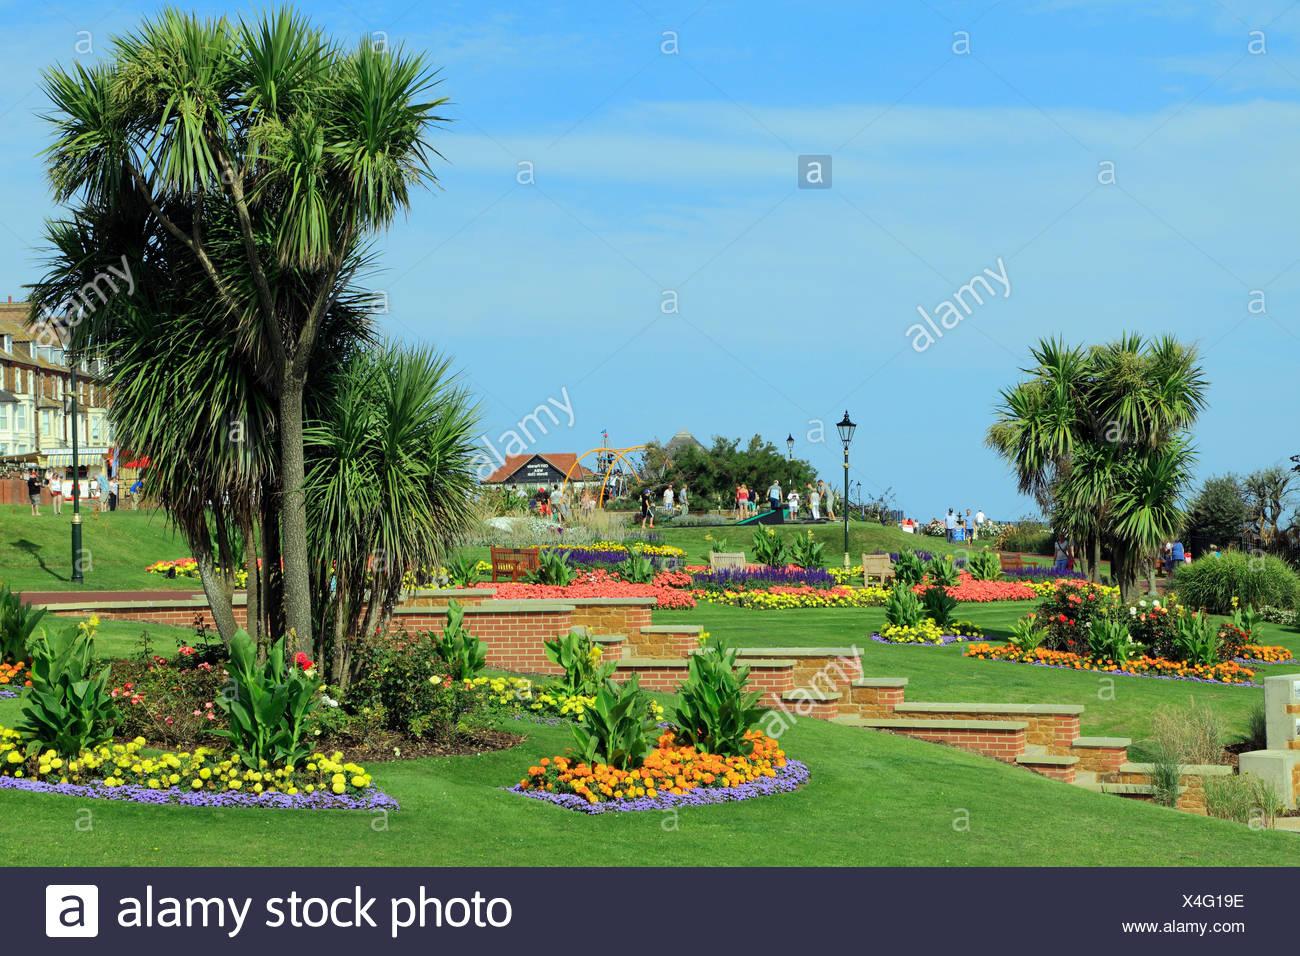 Esplanade Gardens, Cliff top Marine Parade,, Hunstanton, Norfolk, England, UK, seaside resort - Stock Image